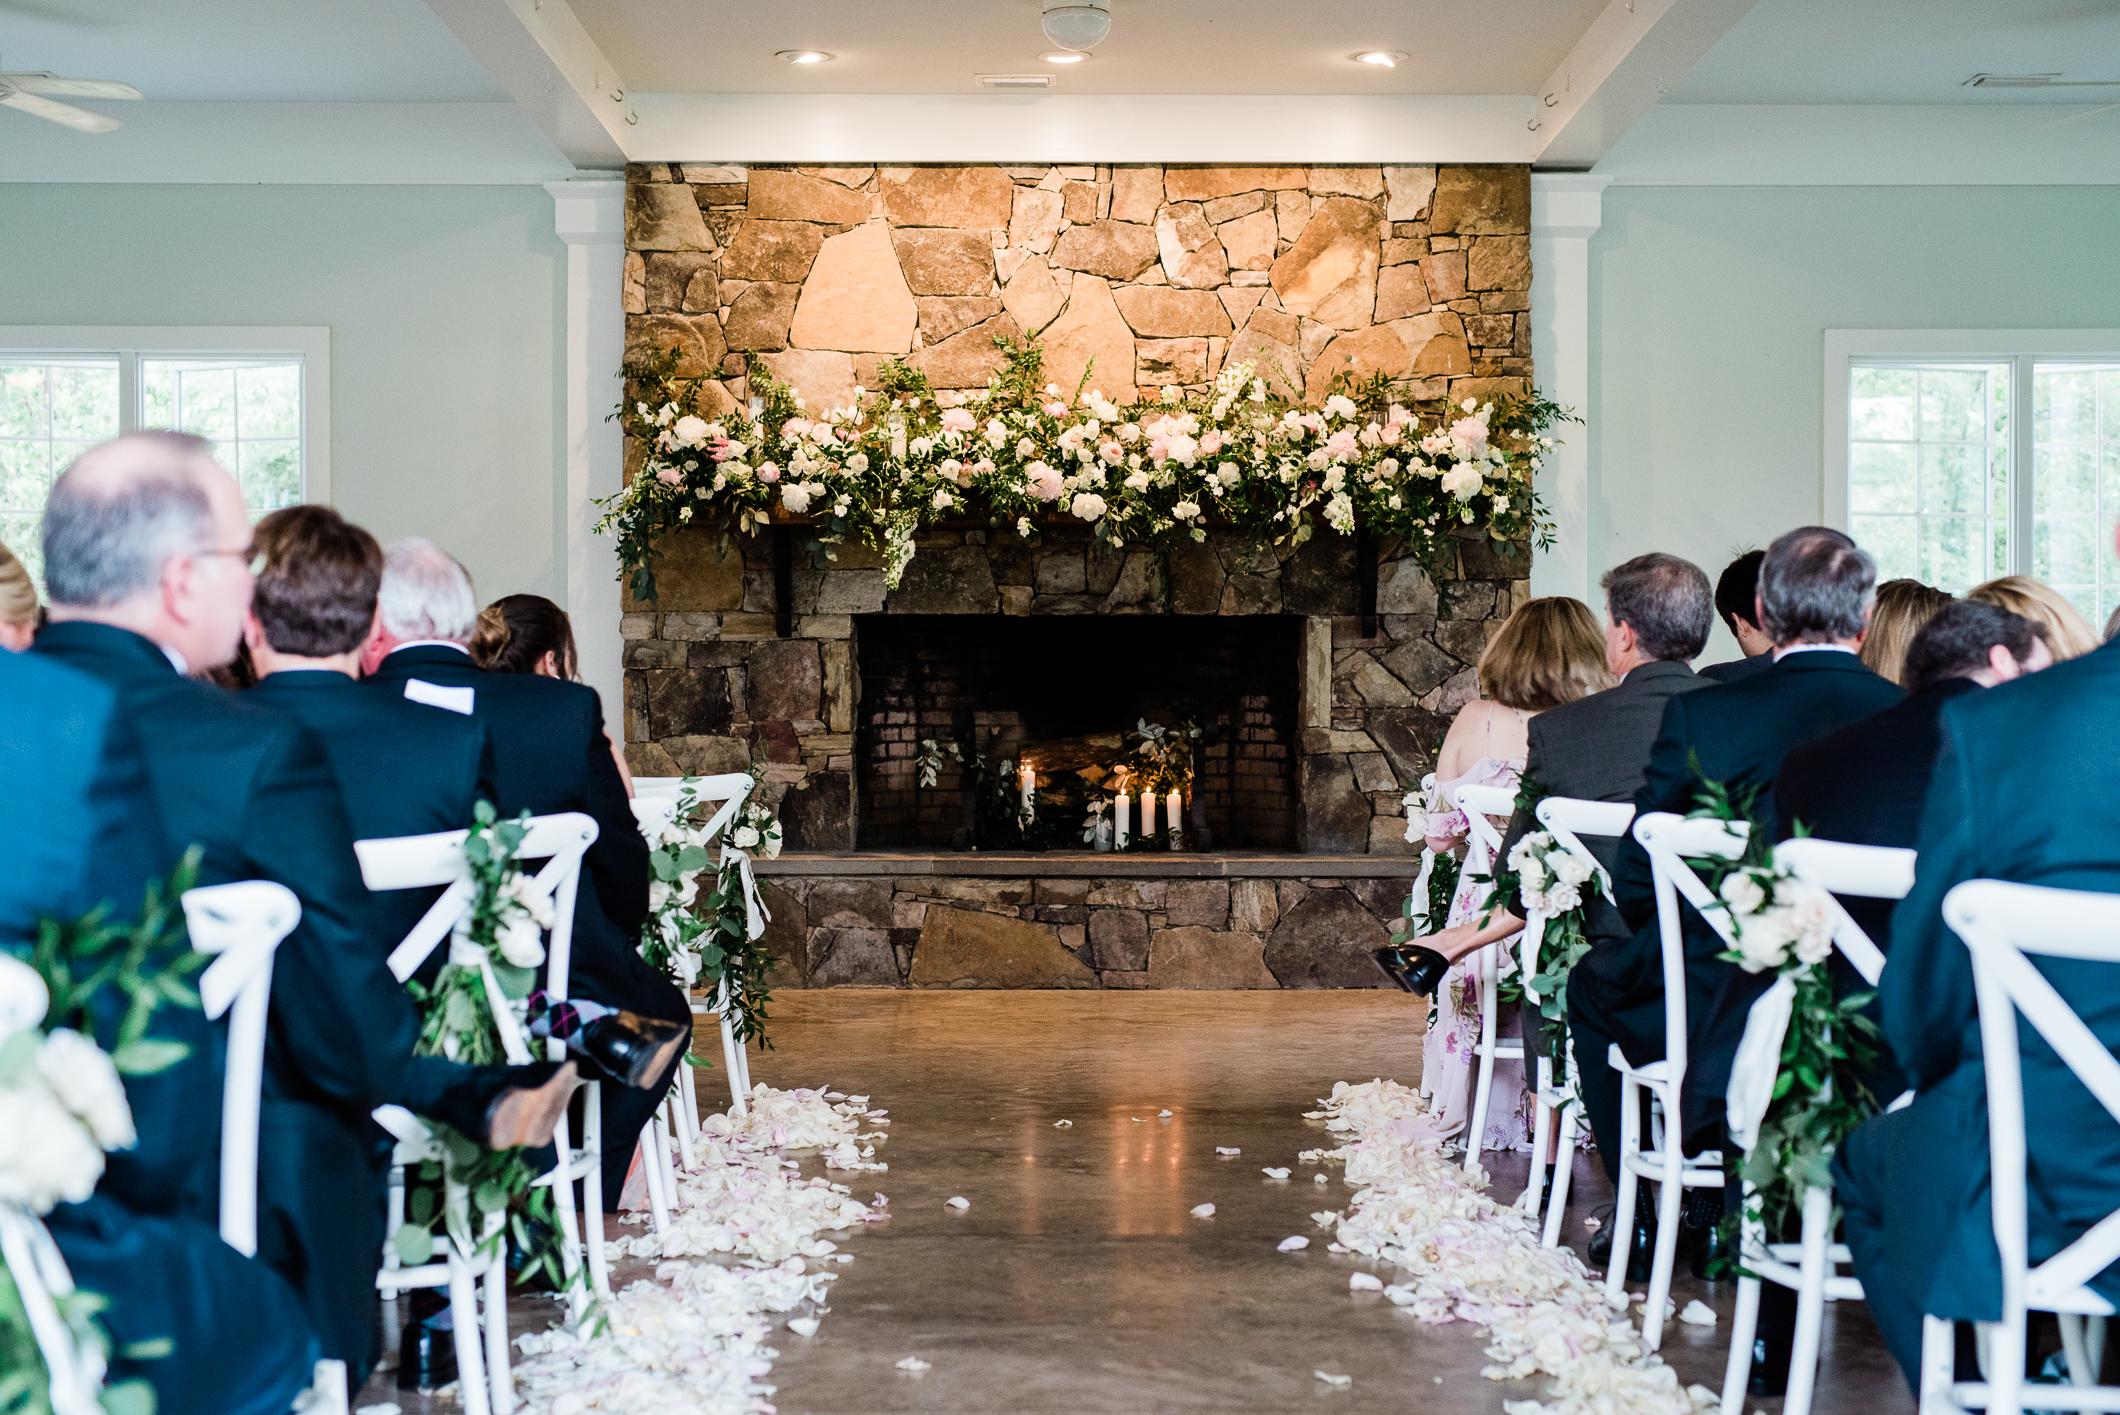 Indoor wedding ceremony at Fearrington Village